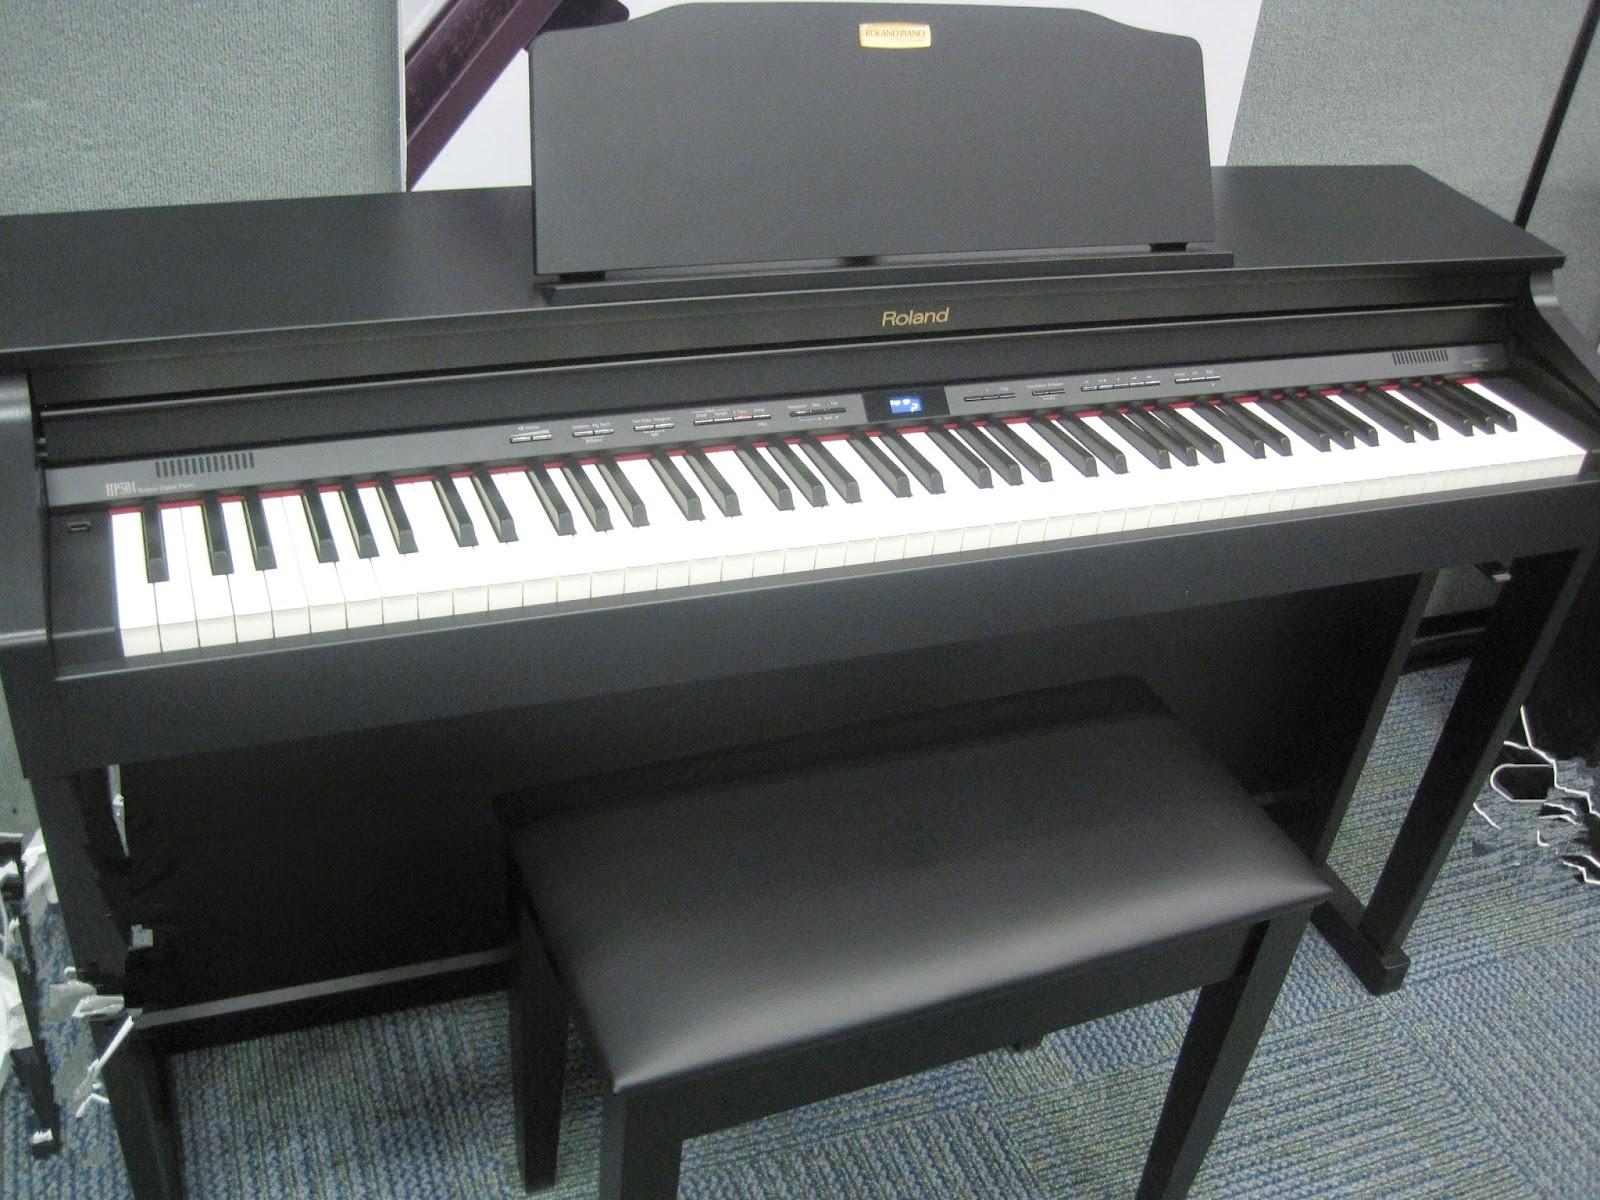 az piano reviews reviews digital pianos under 2500 top picks. Black Bedroom Furniture Sets. Home Design Ideas